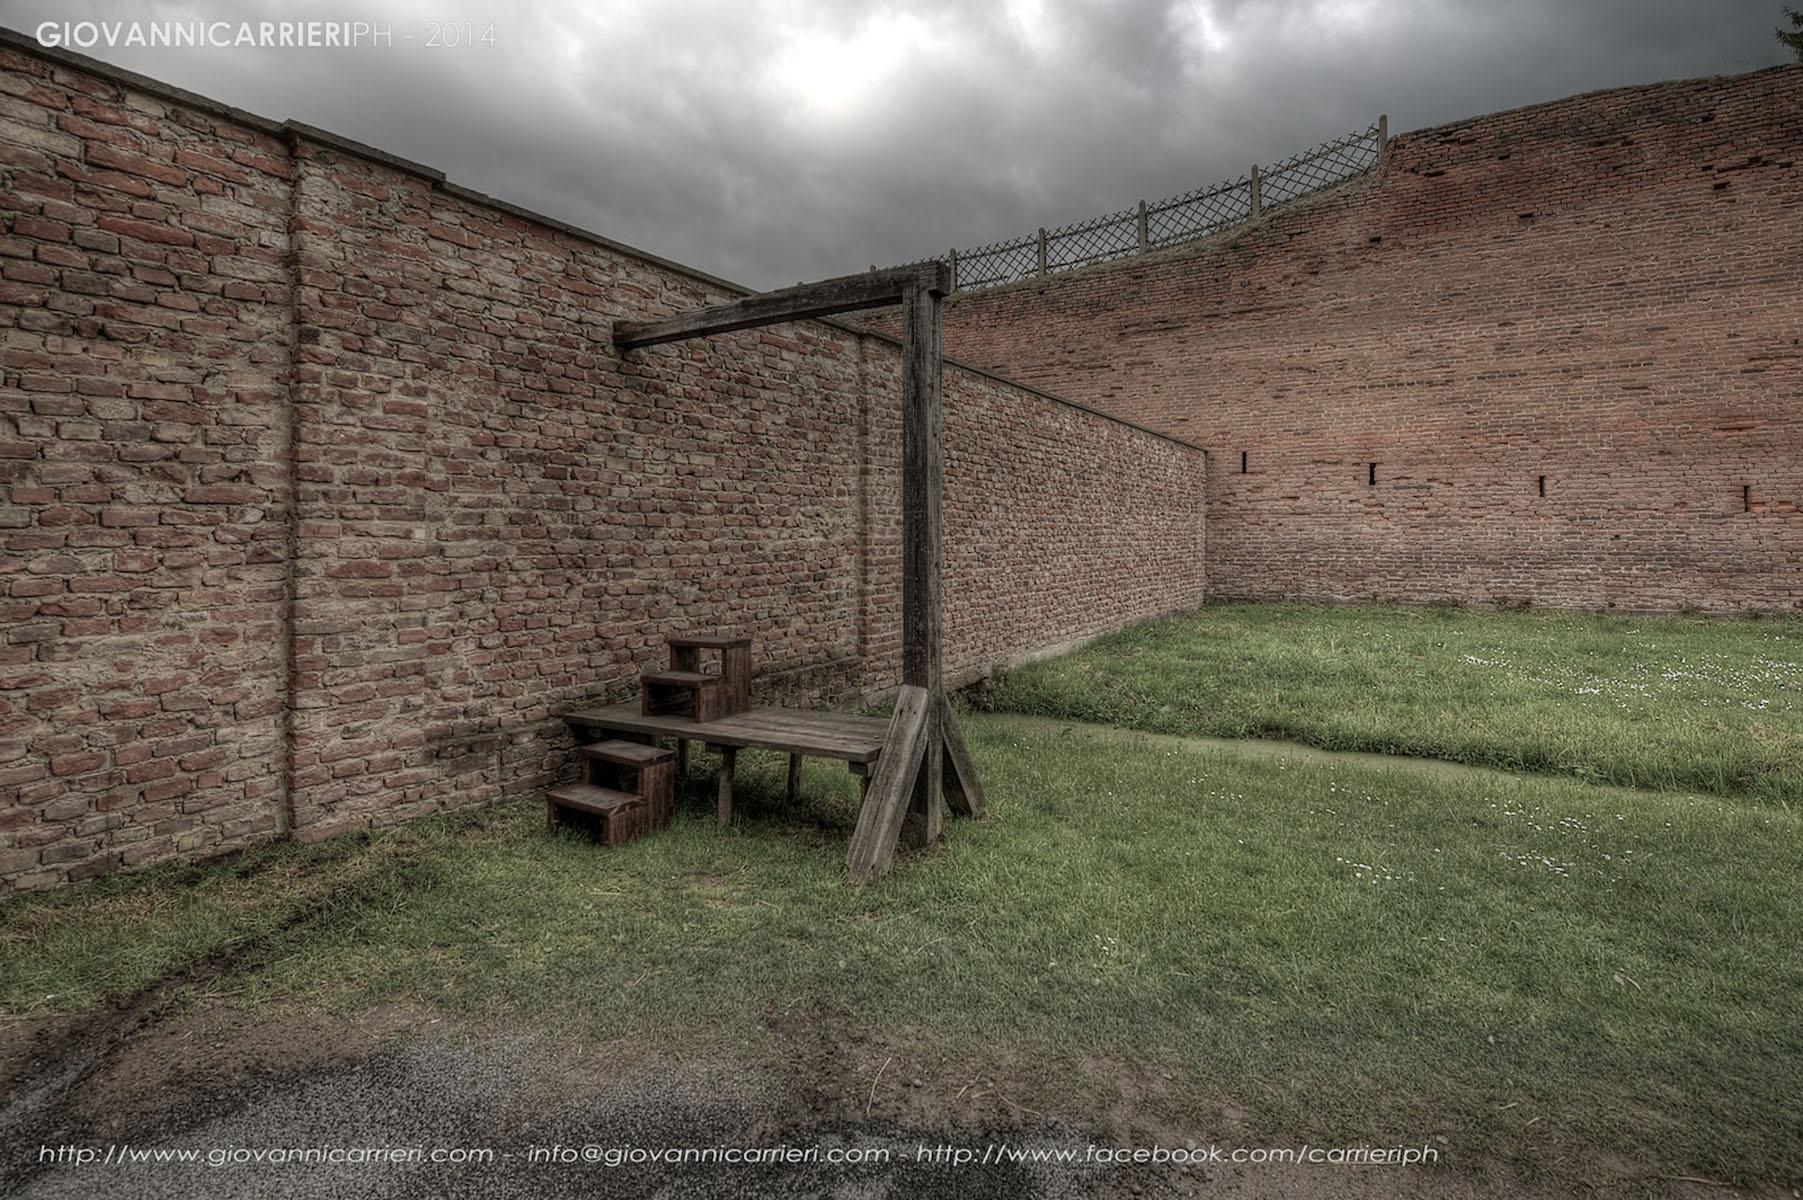 Il patibolo - Theresienstadt